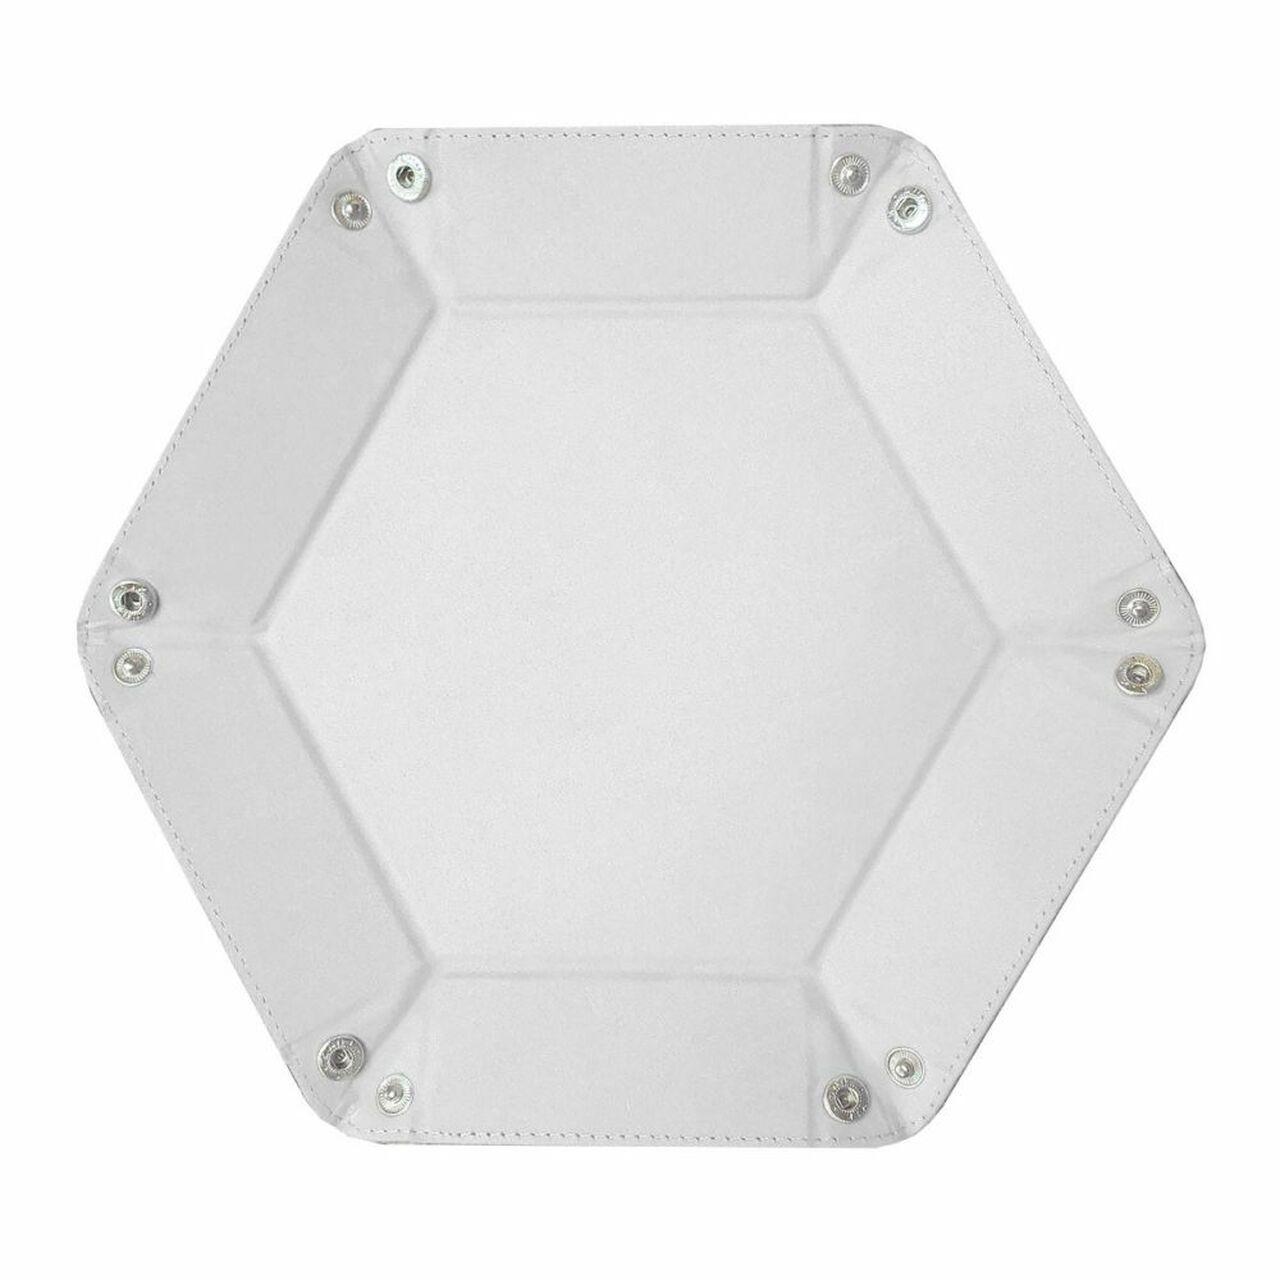 White Hexagon Dice Tray